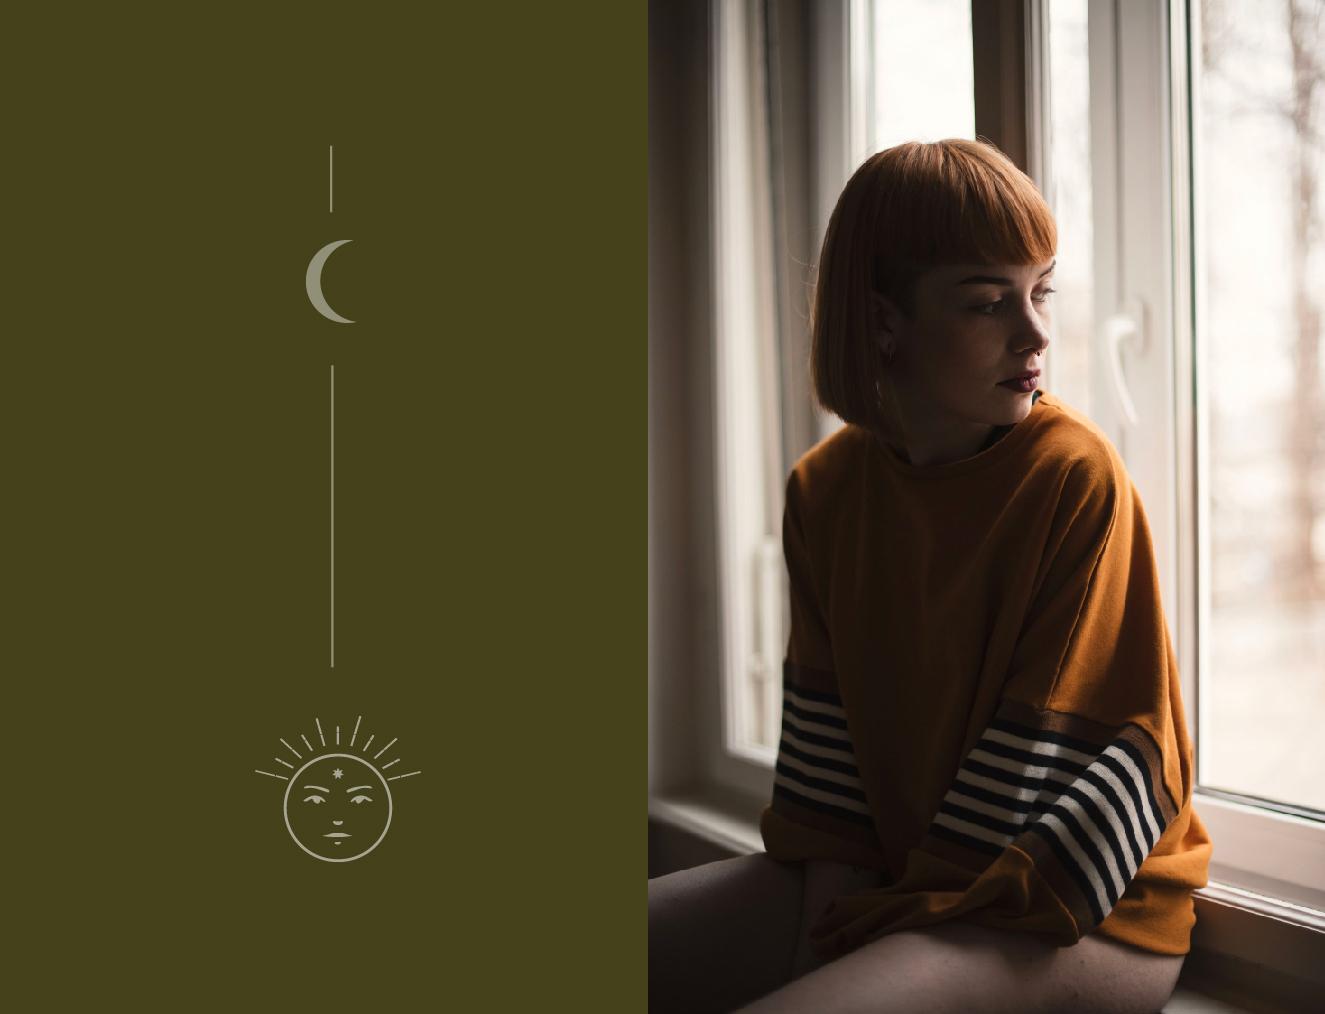 marie-babeau-graphiste-freelance-photographe-independante-strasbourg-alsace-spirit-capture-creation-logo-elements-graphiques